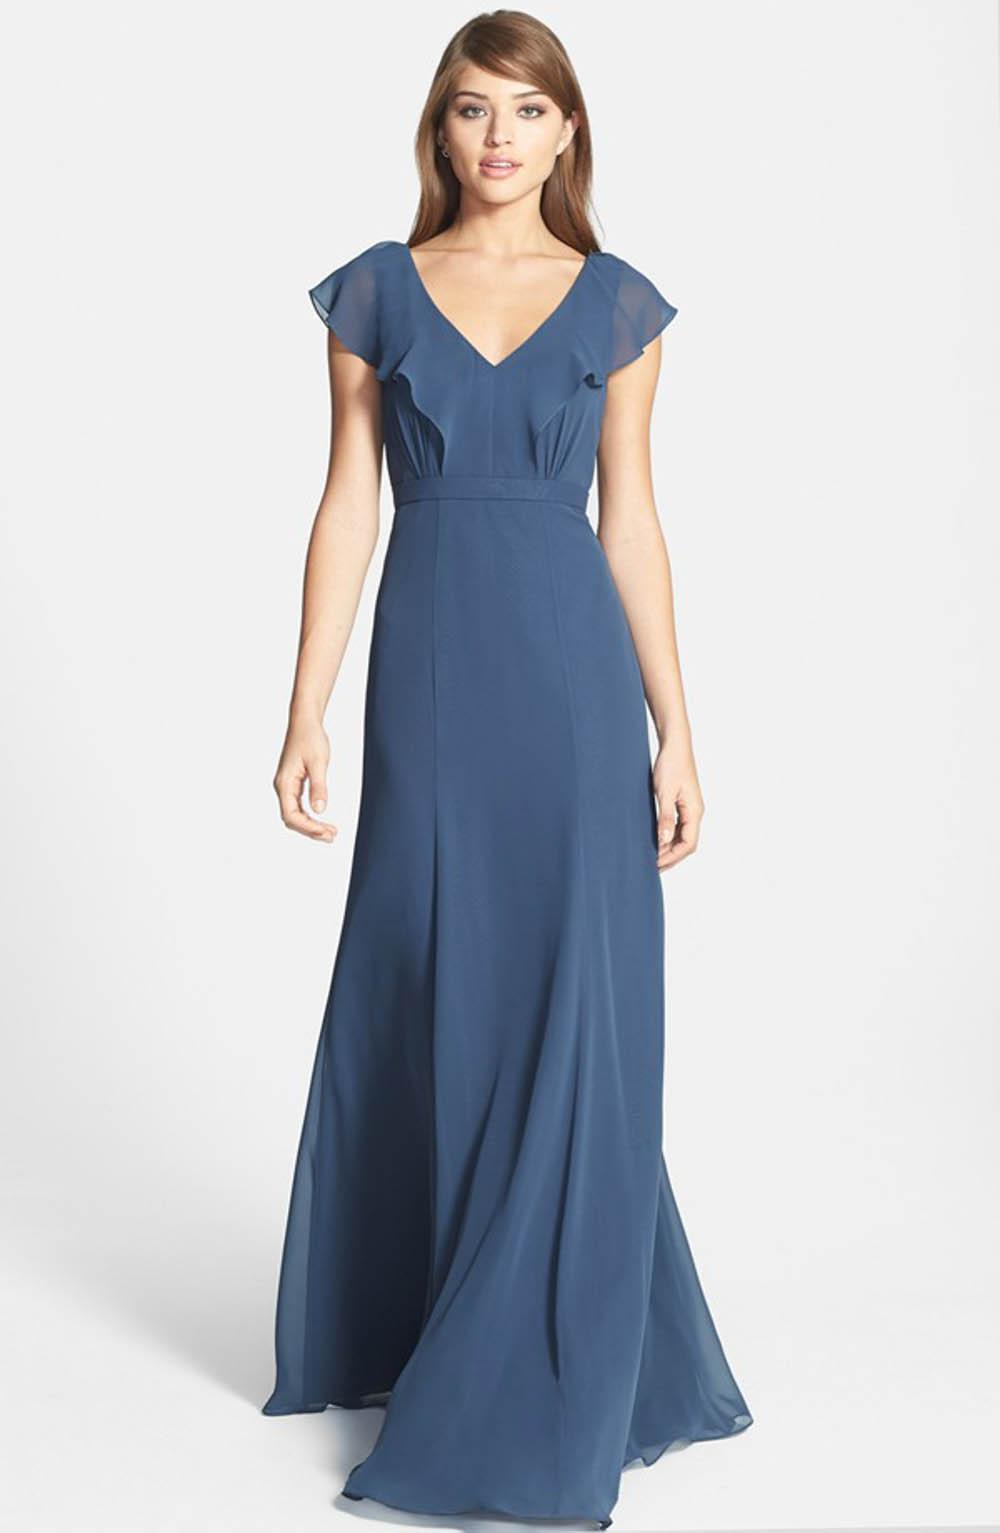 Blue Sleeved Bridesmaid Dress